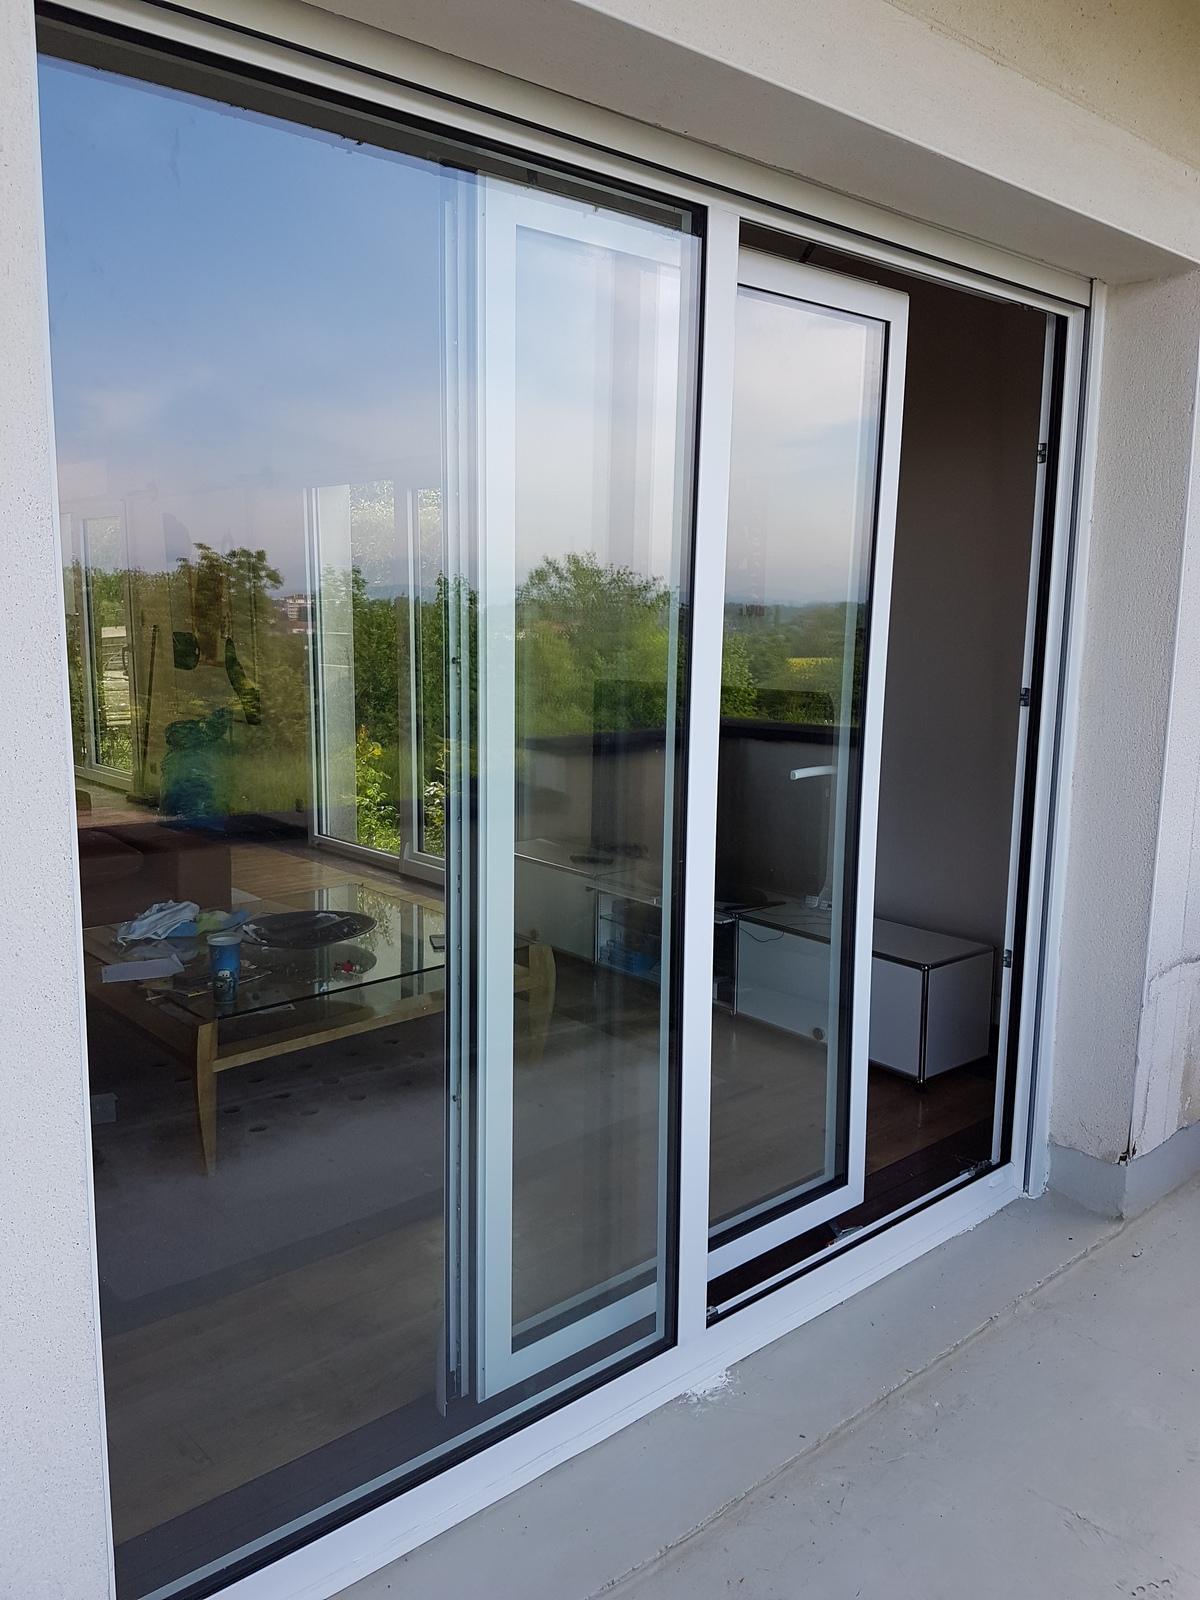 Fenêtres et portes fenêtres MIROX en France